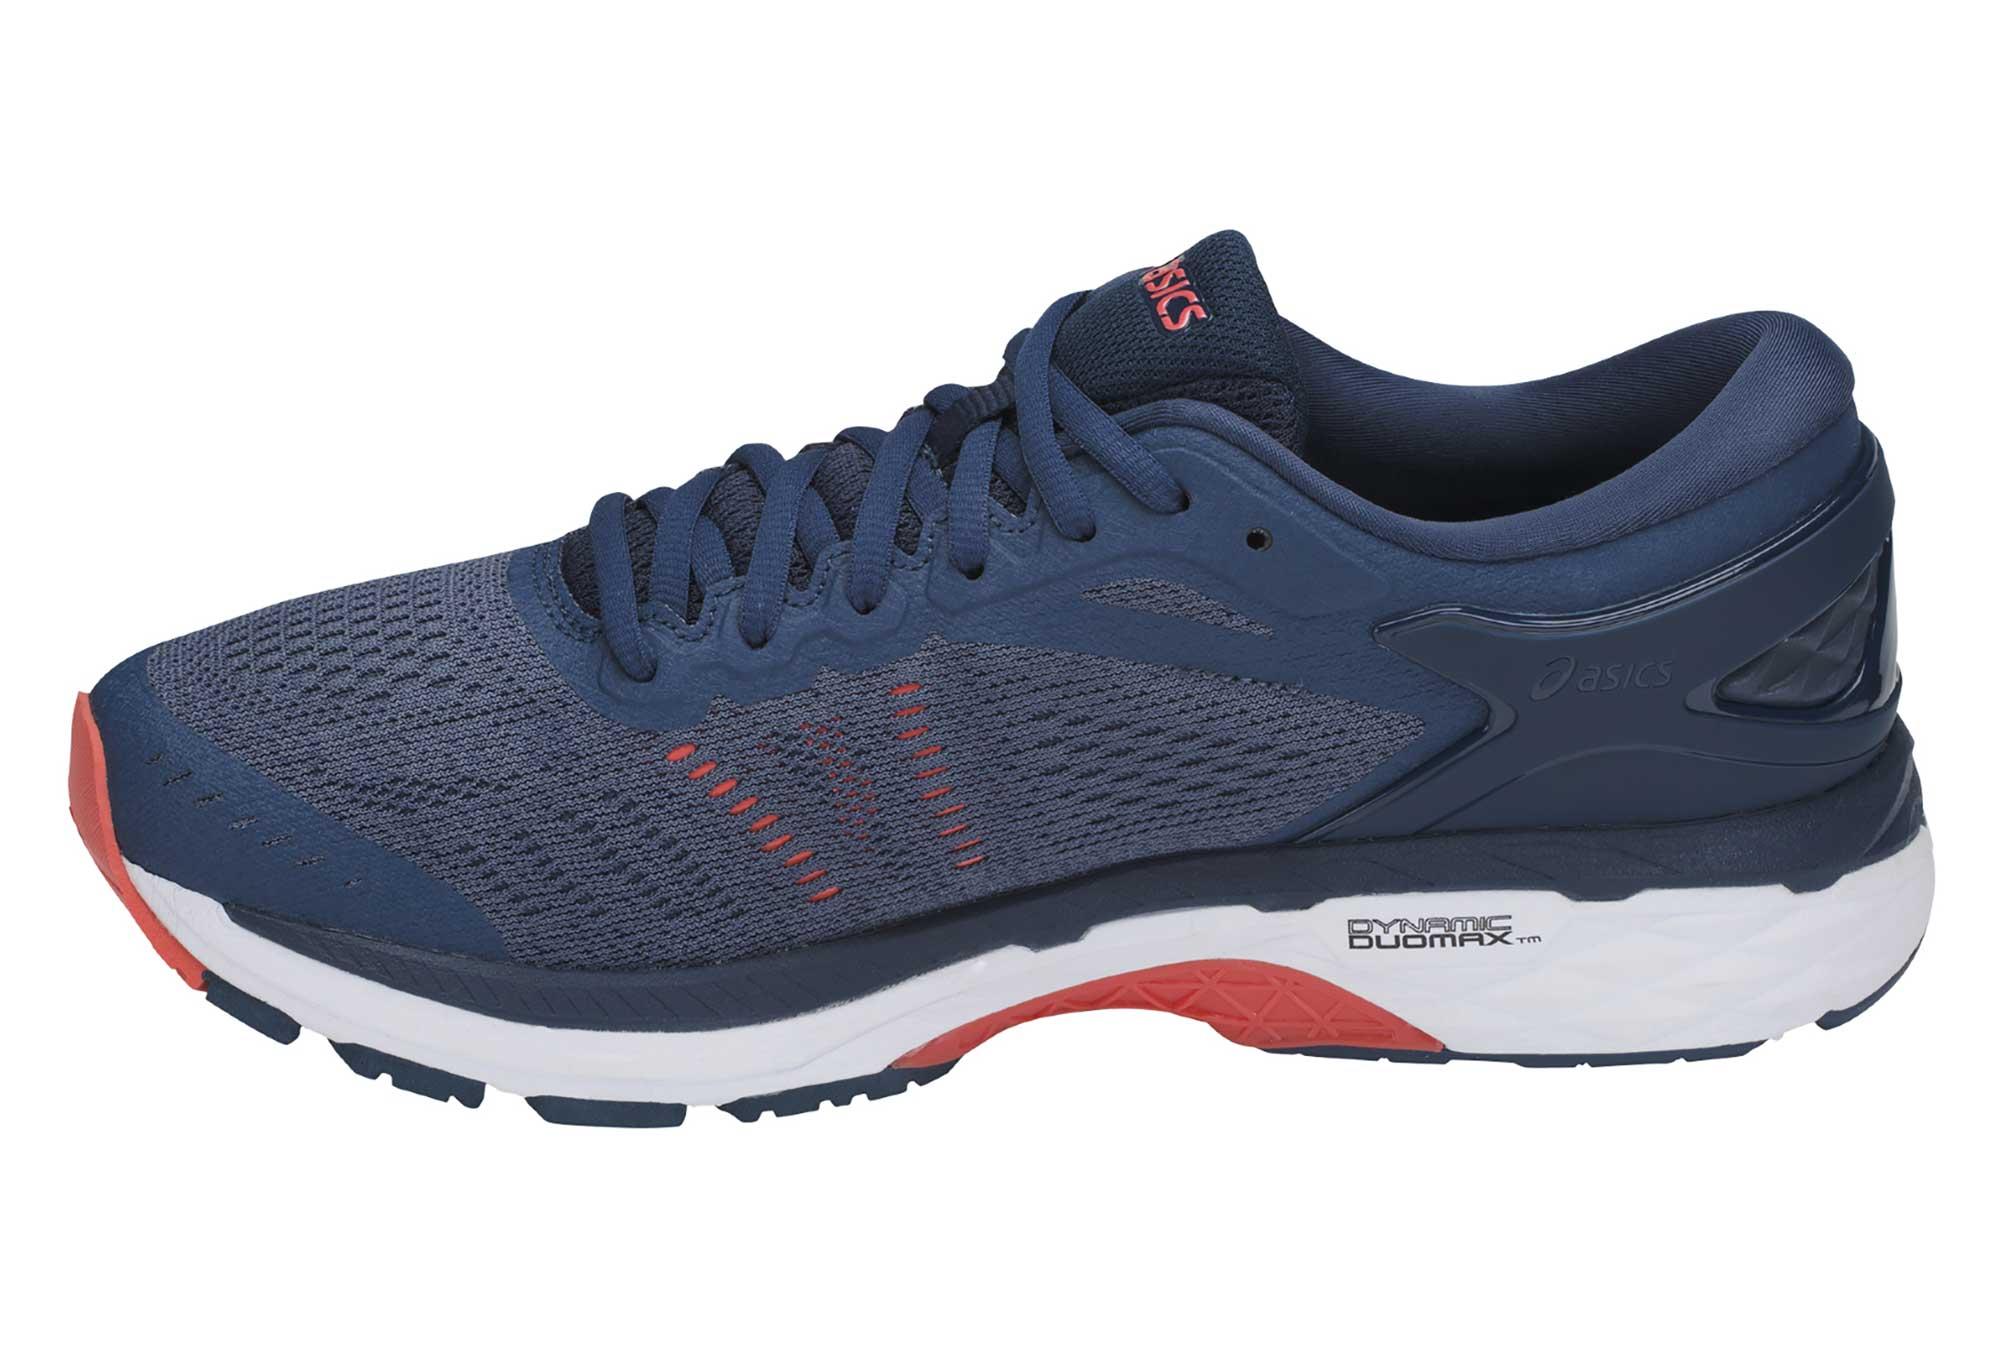 Kayano Chaussures Bleu Gel Asics Running 24 De qwrwI684